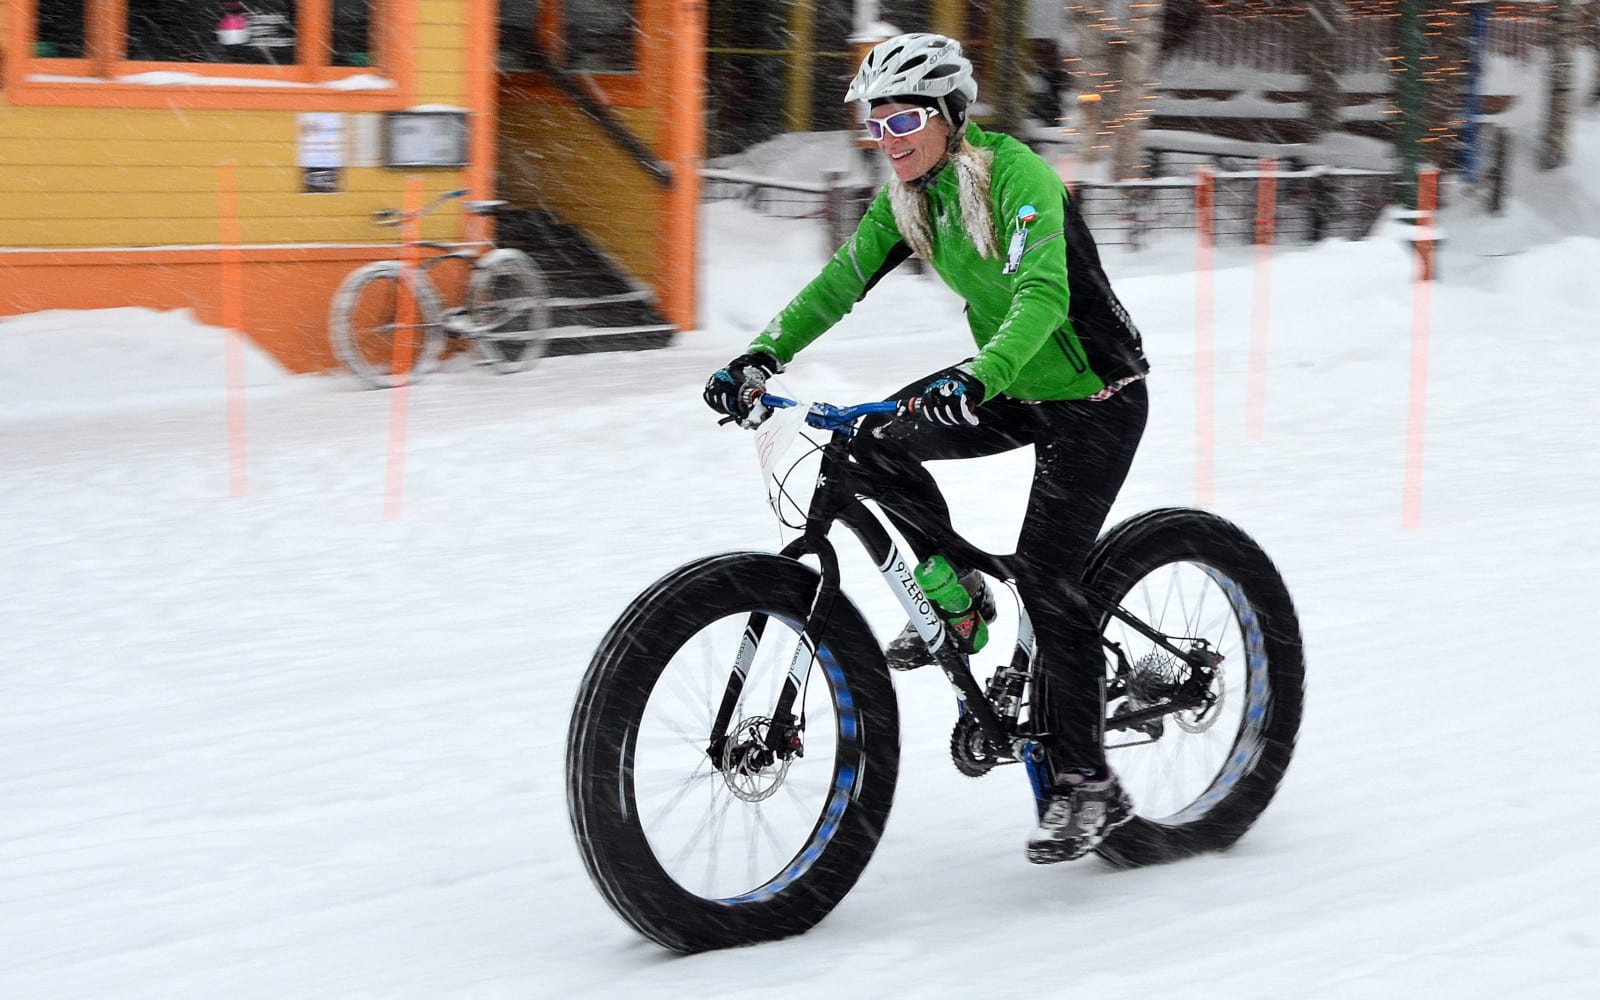 Winter Mountain Biking Crested Butte CO Fat Bike